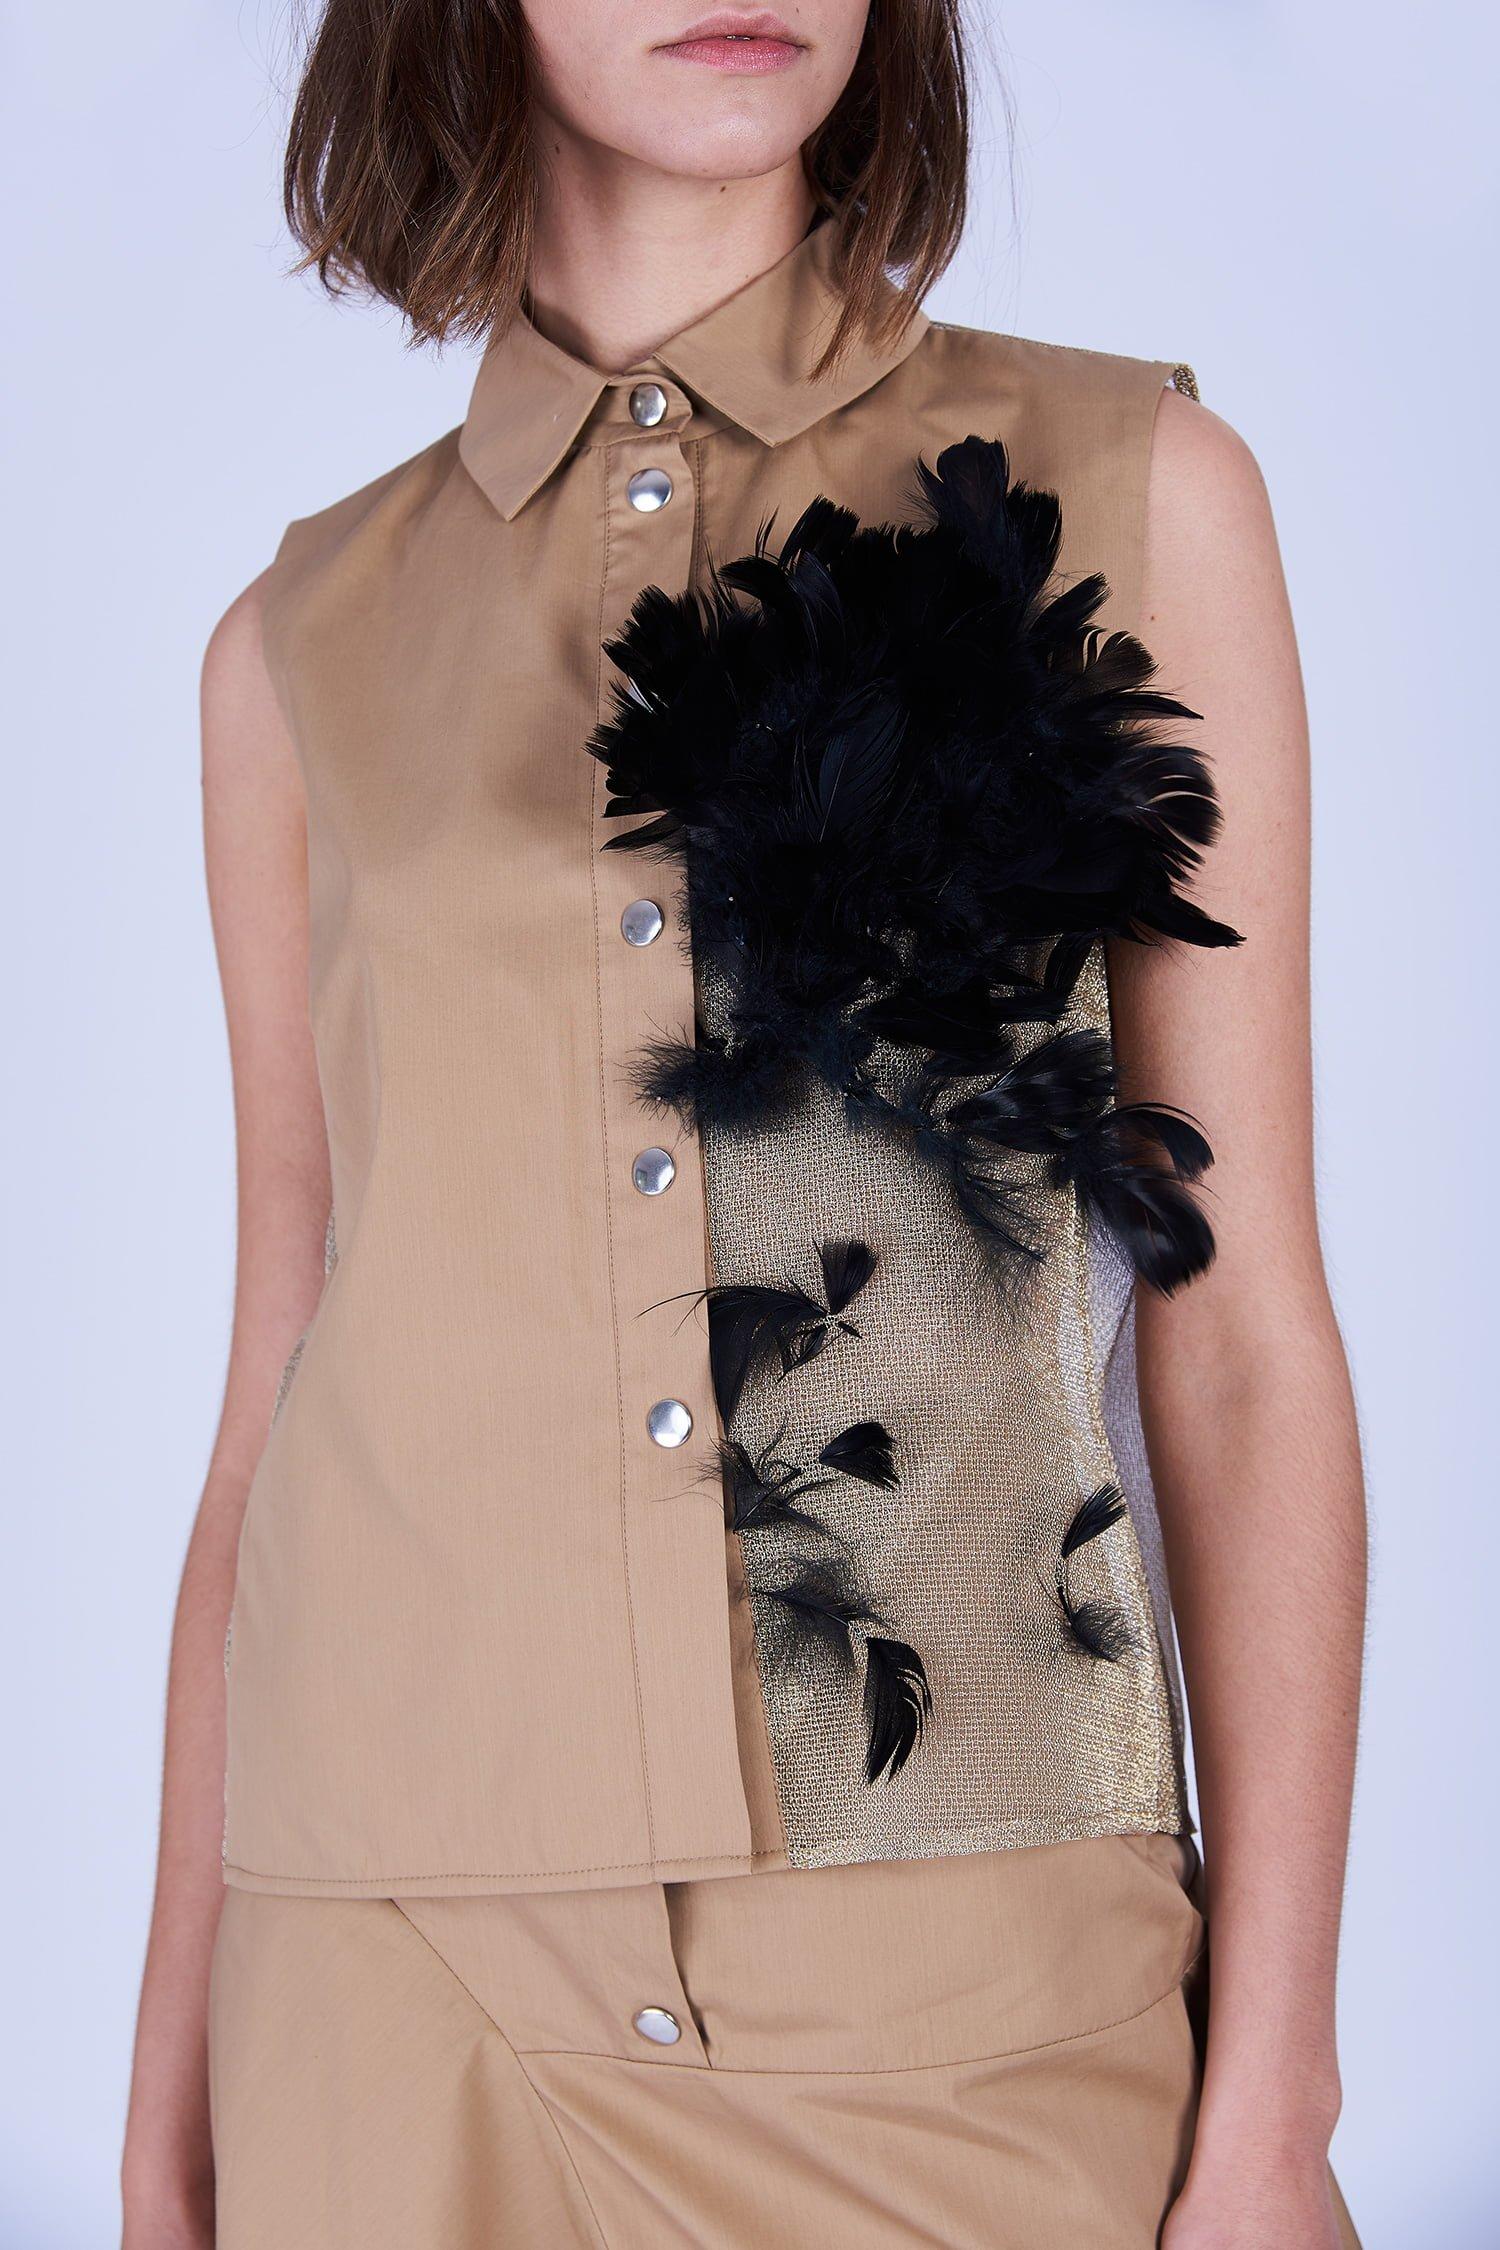 Acephala Ss2020 Beige Shirt Feathers Koszula Piorami Detail Front